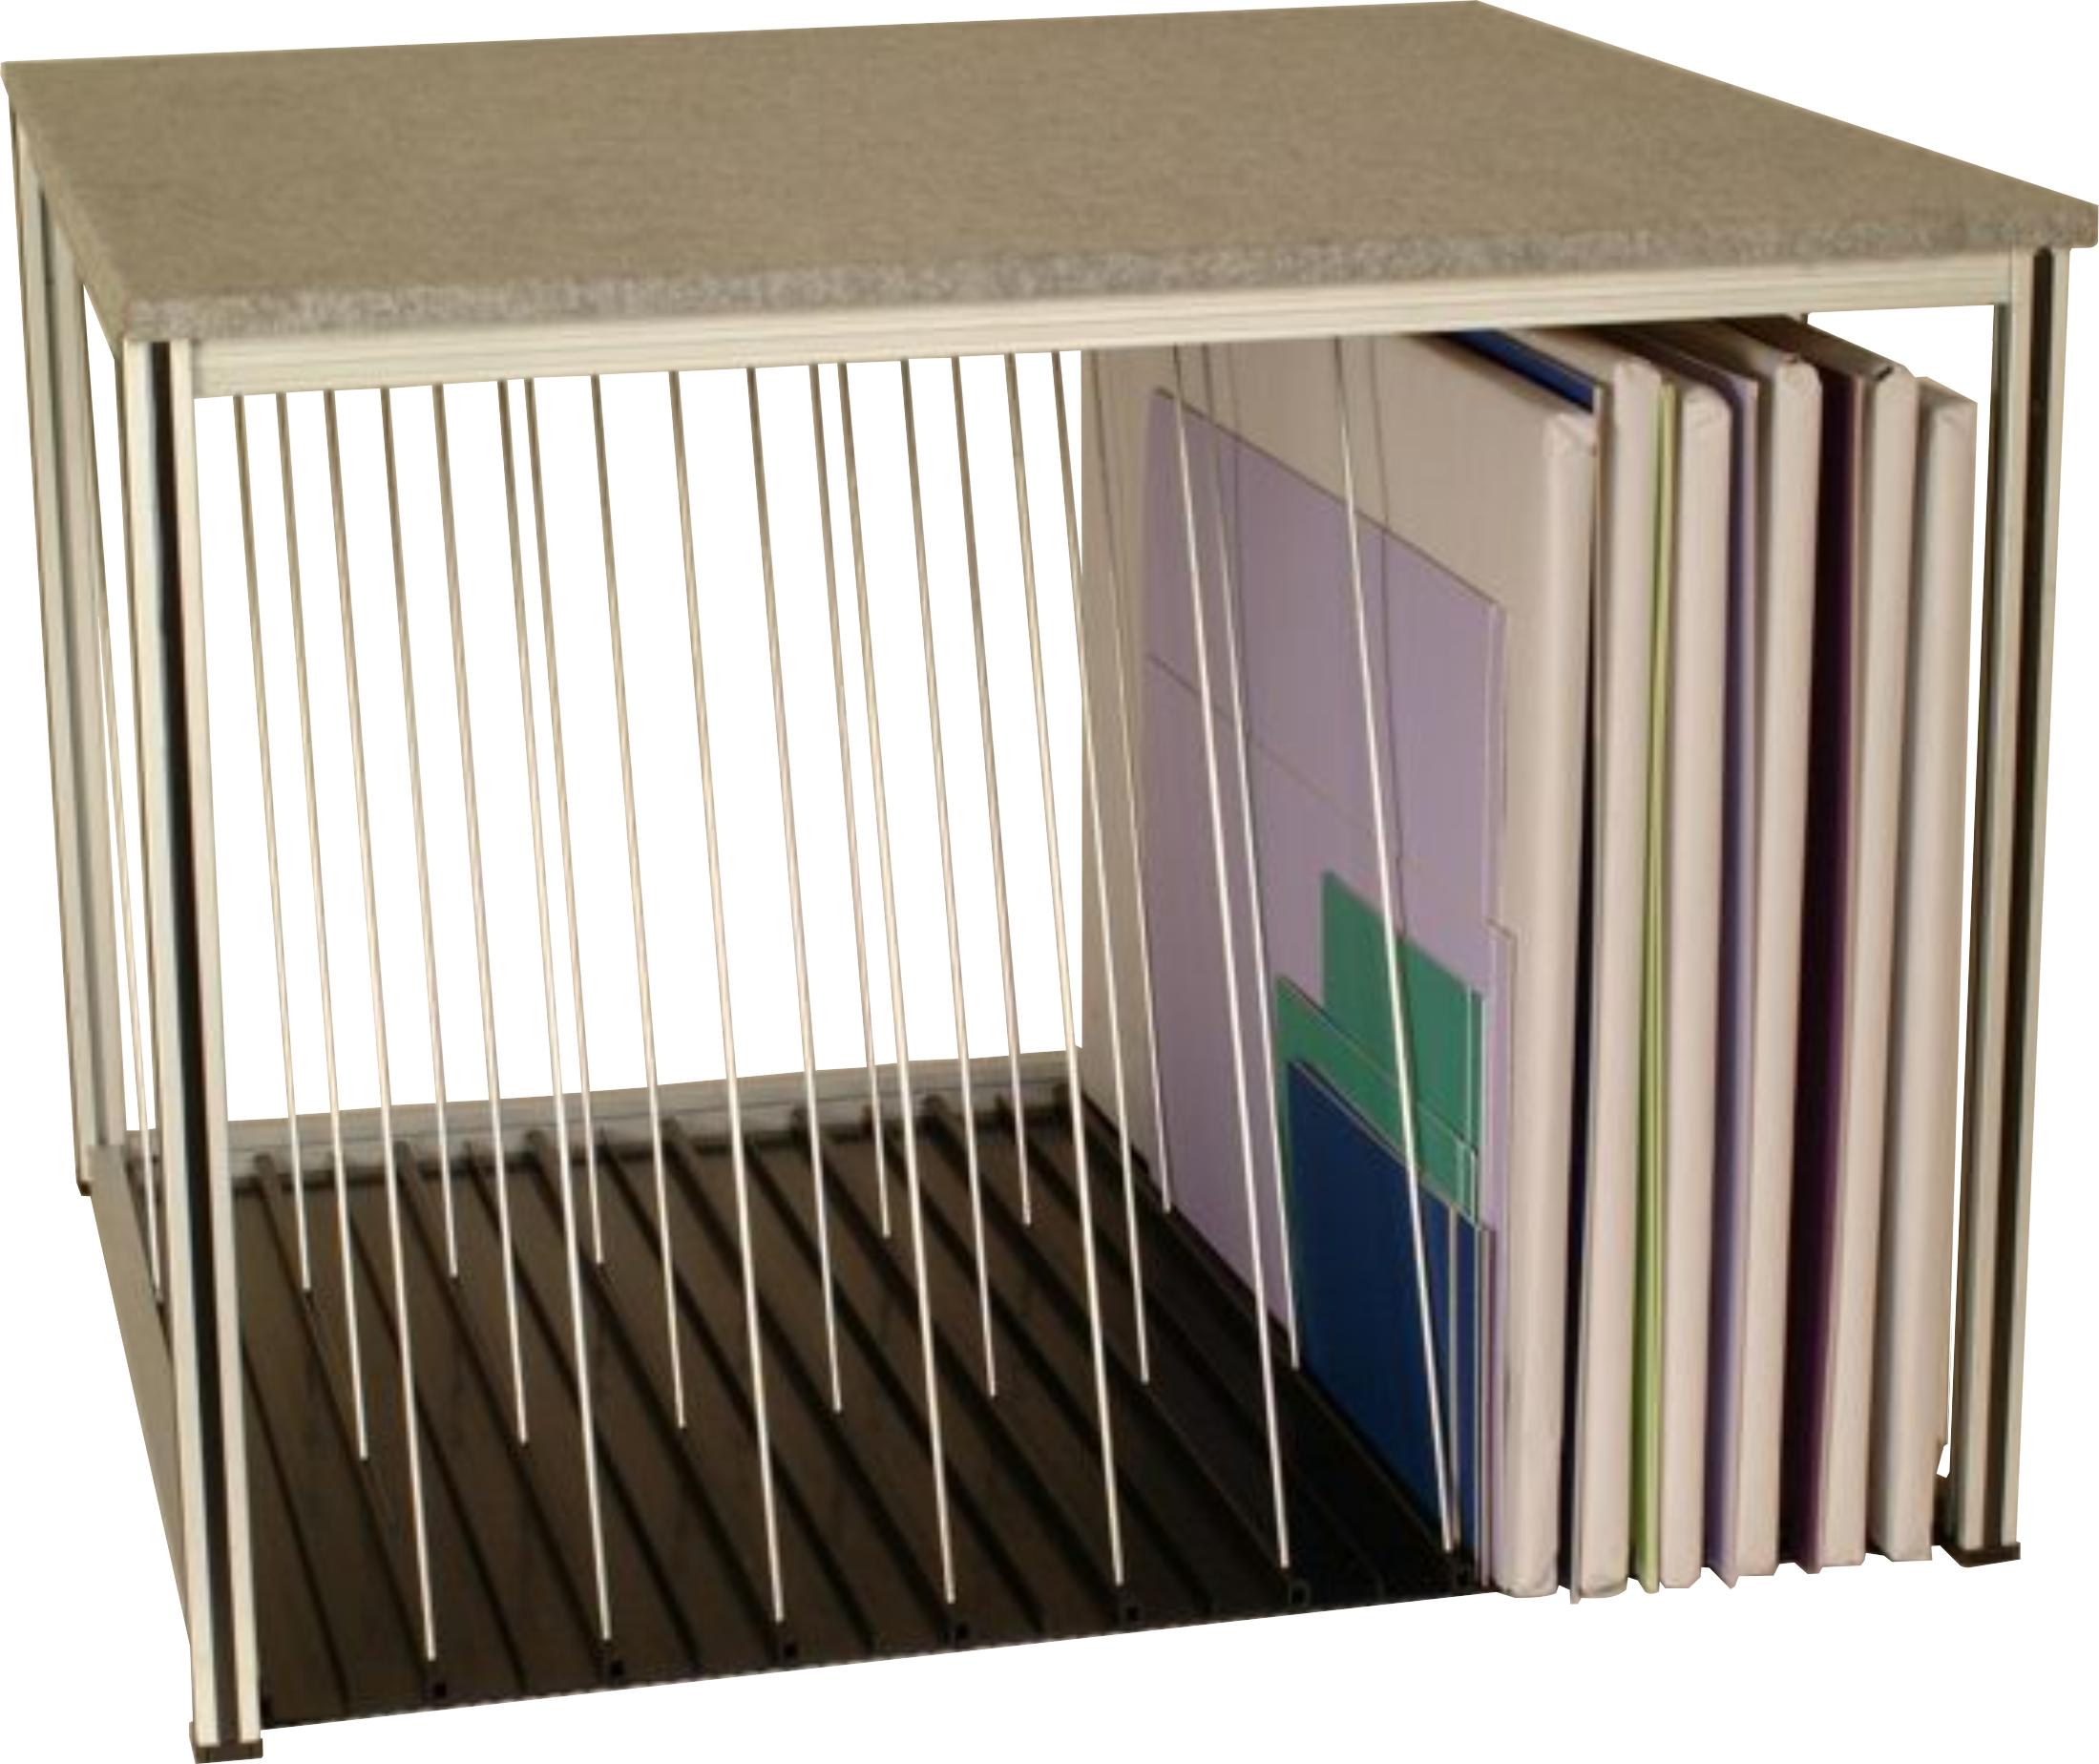 board storage 48 wx46 dx35 5 h 10 slots